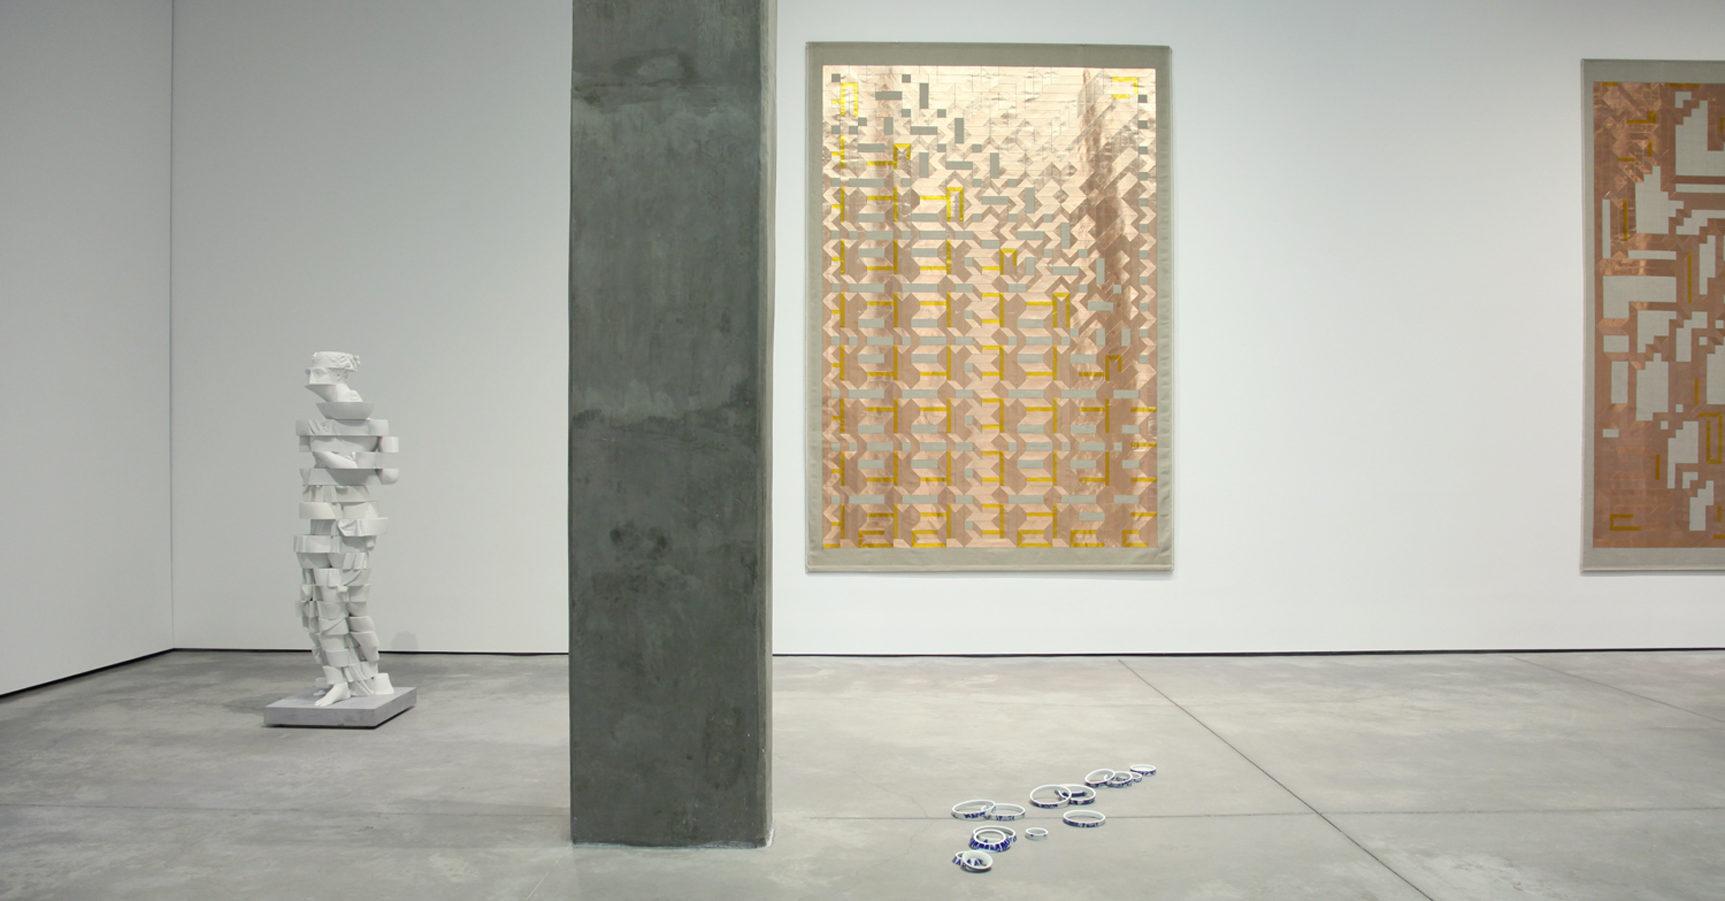 'Compression Loss', Installation View, OMR, 2017 | Troika (Conny Freyer, Eva Rucki, Sebastien Noel)